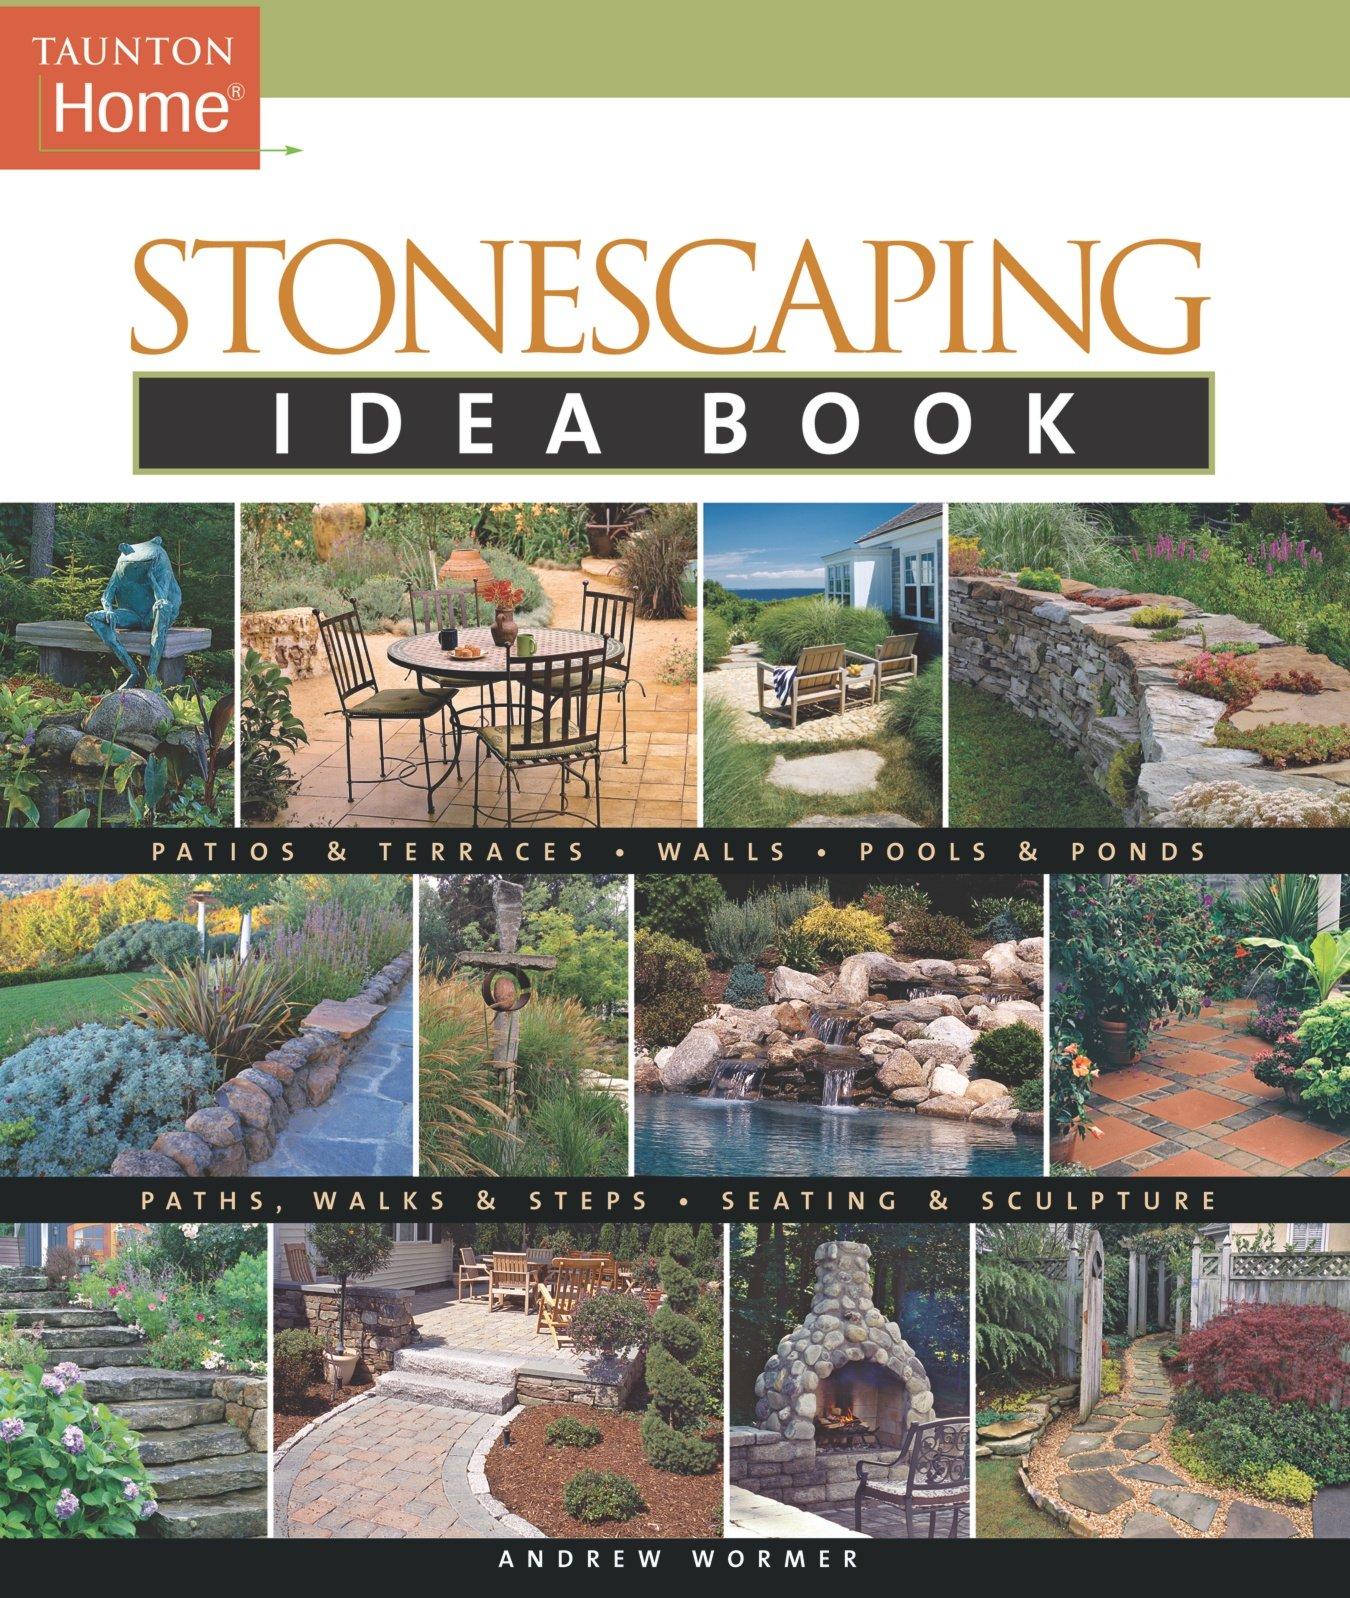 stonescaping-idea-book-taunton-s-idea-book-series